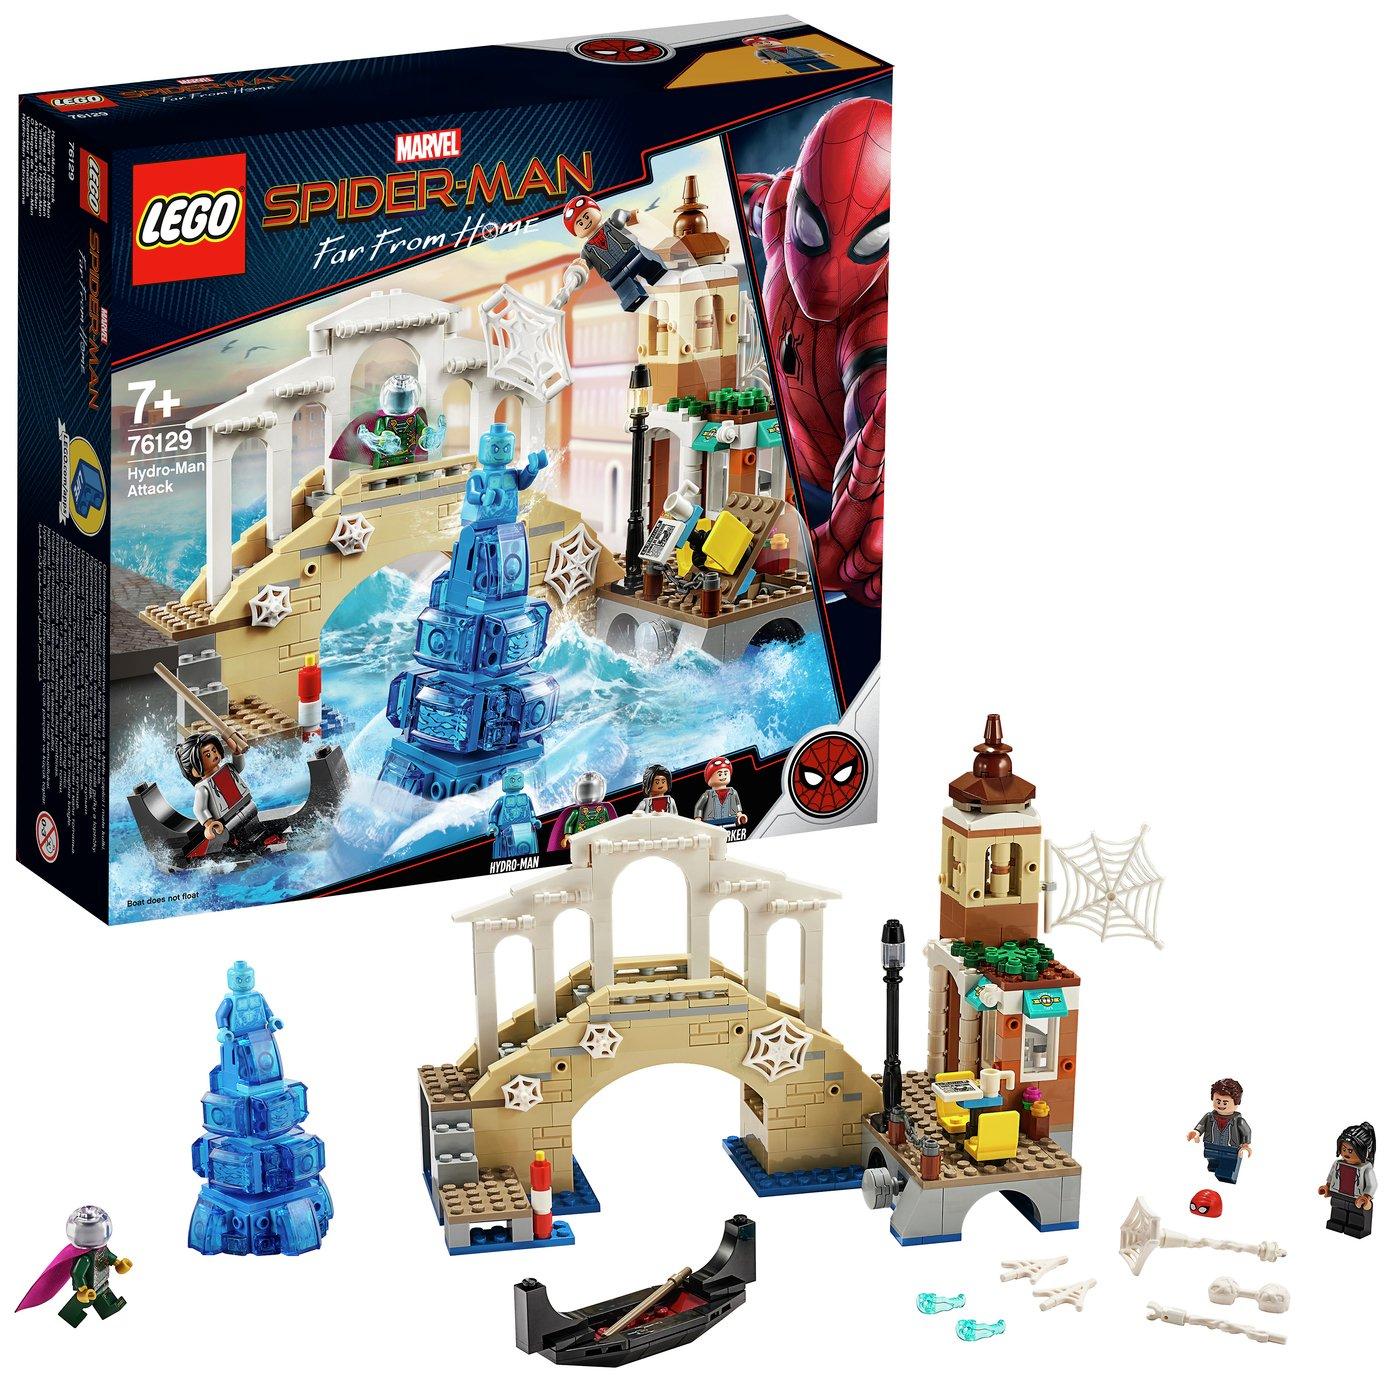 LEGO Marvel Spider-Man Hydro-Man Attack Toy - 76129